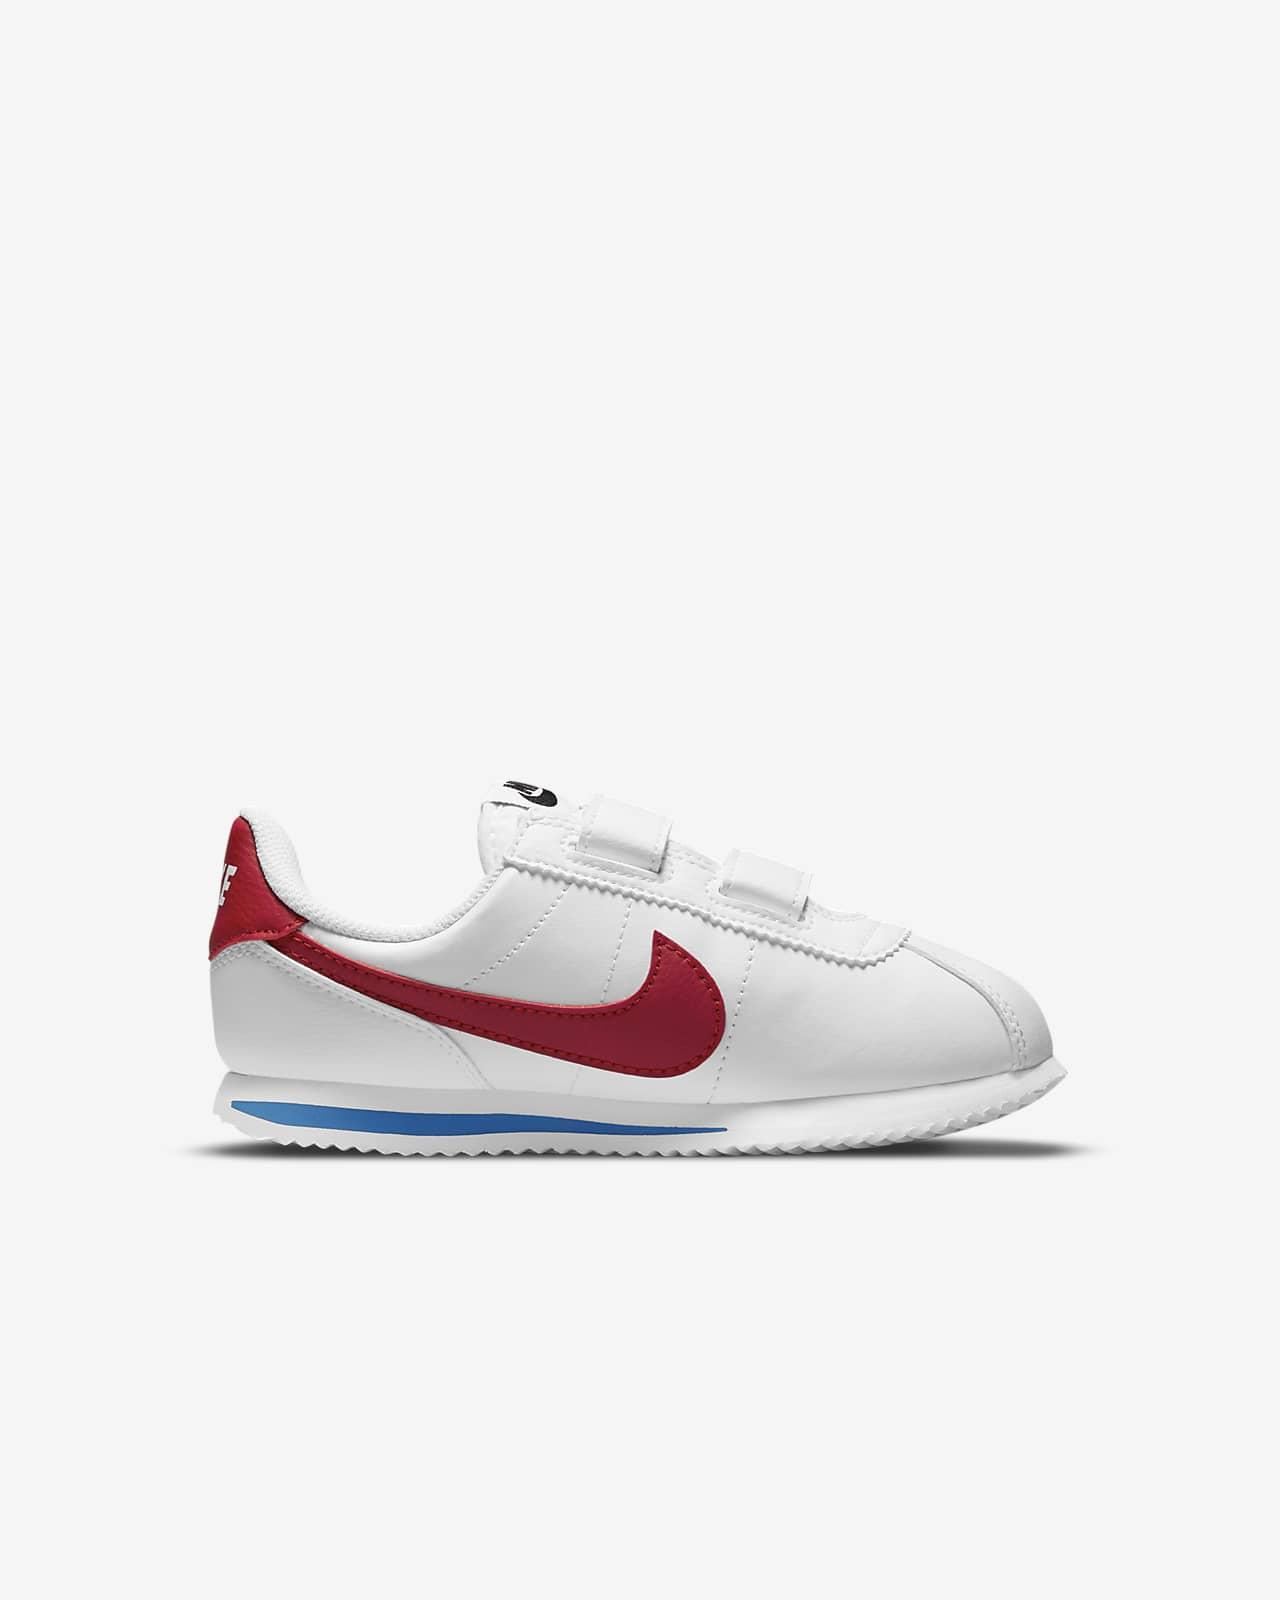 Azul Puntuación Inconsciente  Nike Cortez Basic SL Younger Kids' Shoe. Nike ID